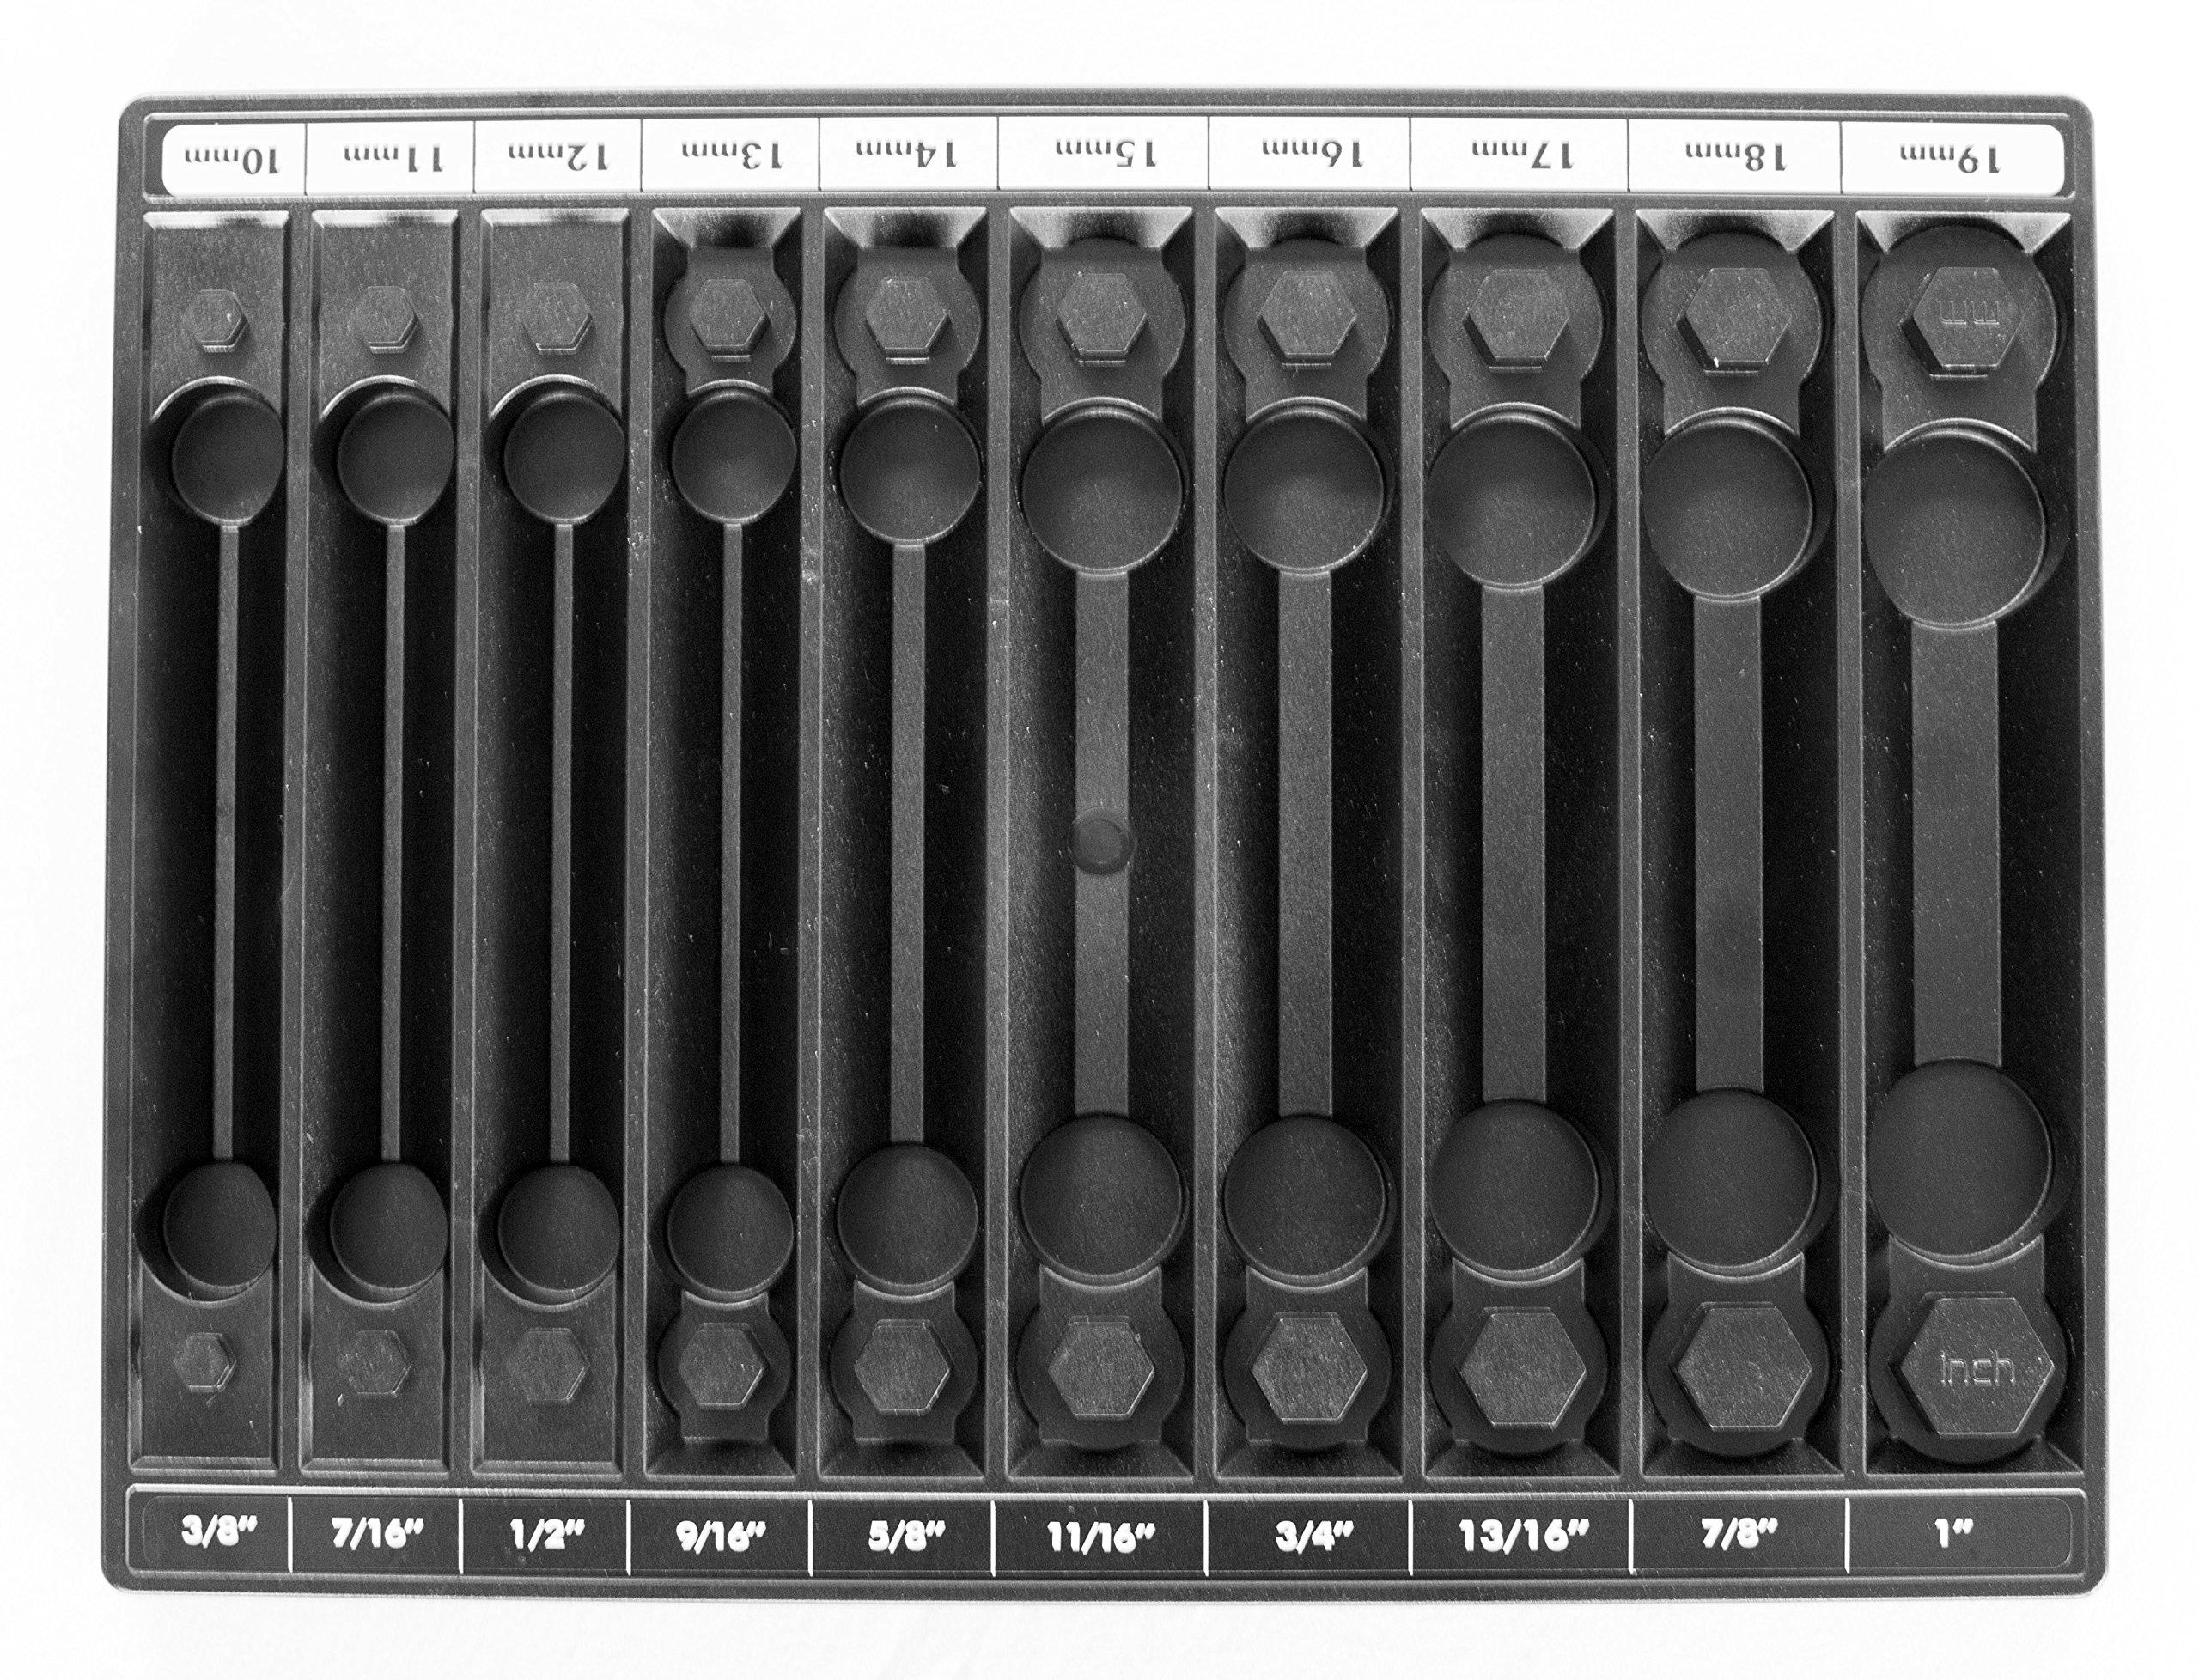 Tool Sorter Socket Organizer - Black